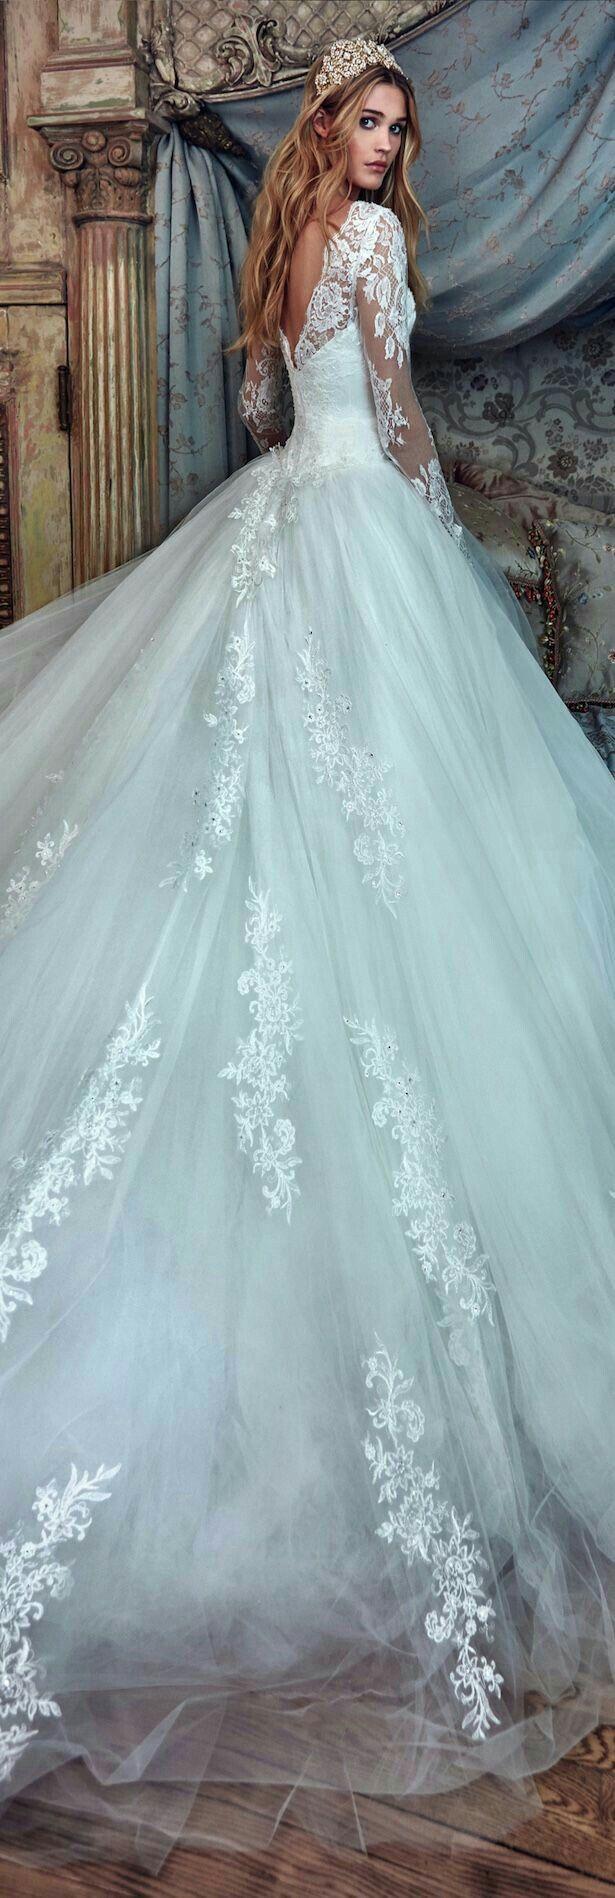 Galia lahav collection le secret royal vestidos gala largos